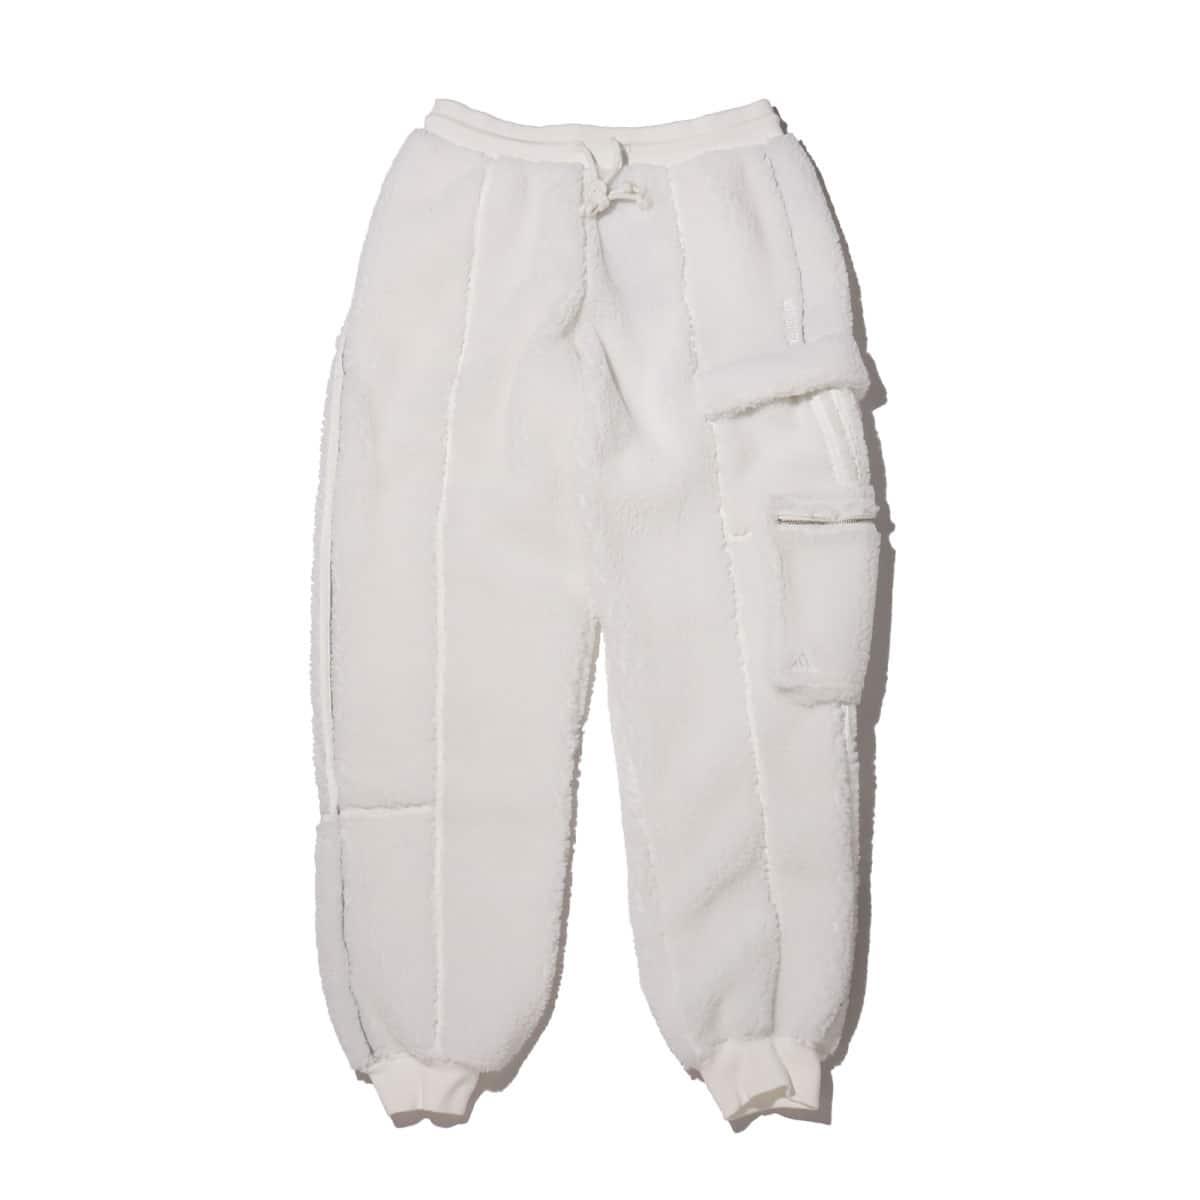 adidas IVP T CRGO 4ALL CORE WHITE 21SS-S_photo_large